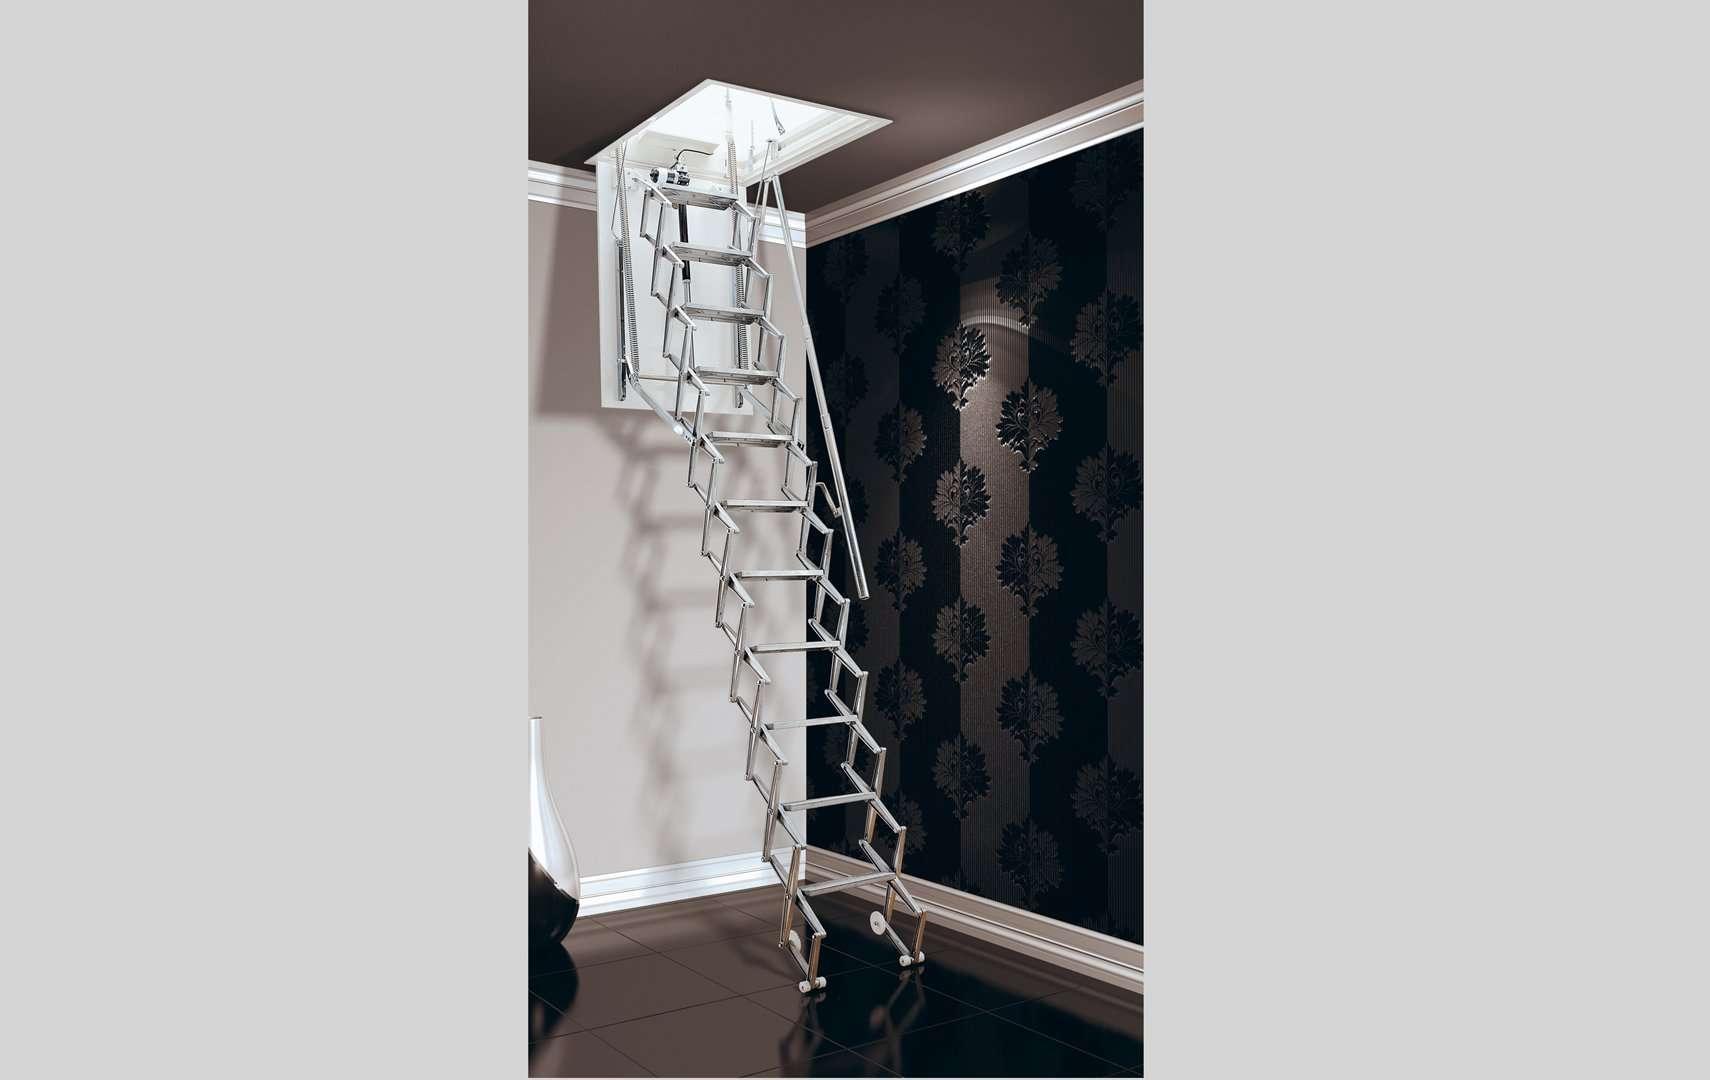 ᐅ Loft-stairs,-loft-staircases | staircases, stairs ...